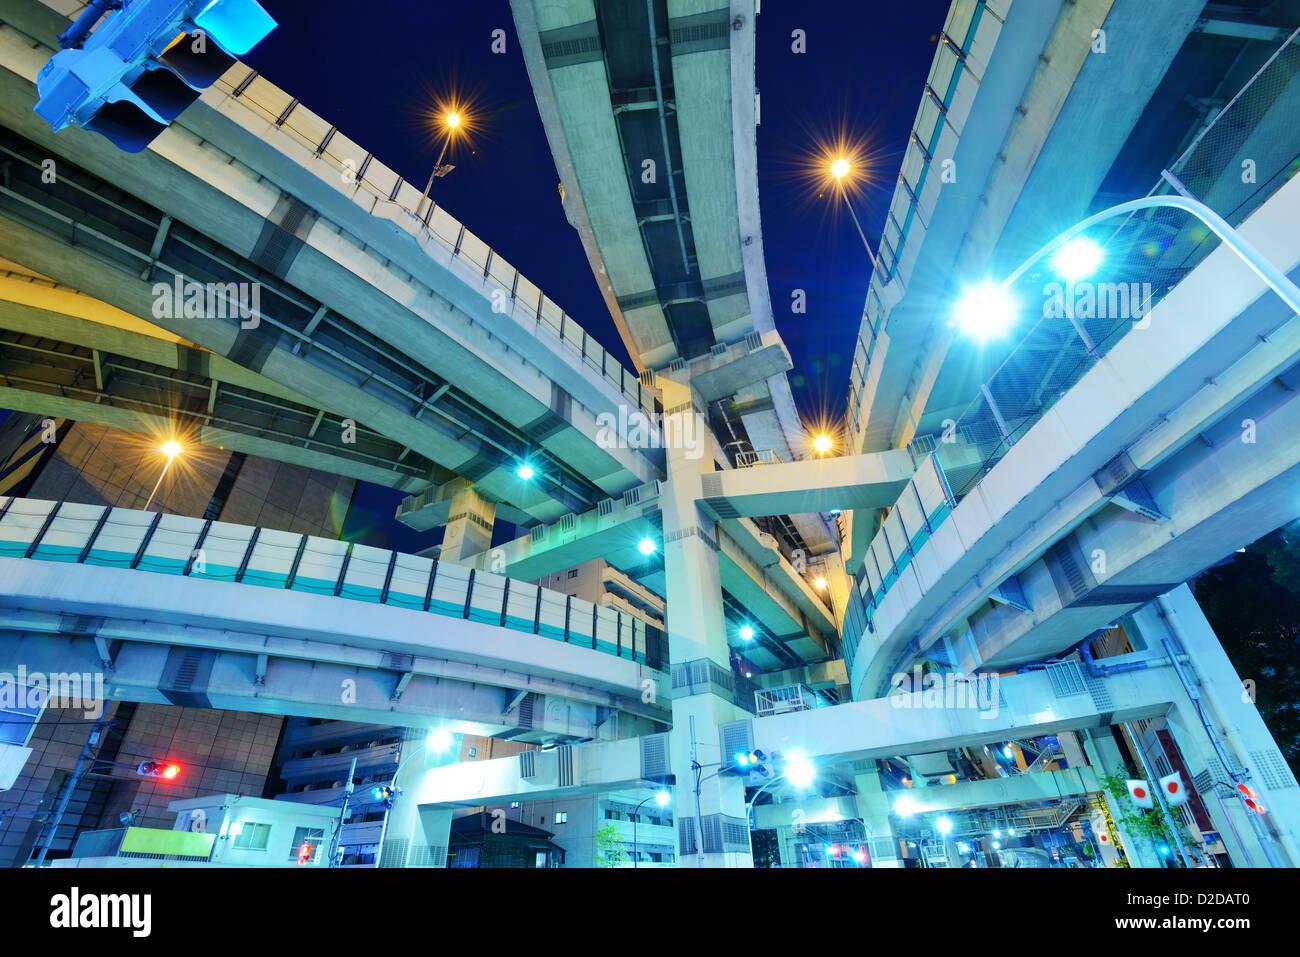 Junction of several highways in Tokyo, Japan. - Stock Image